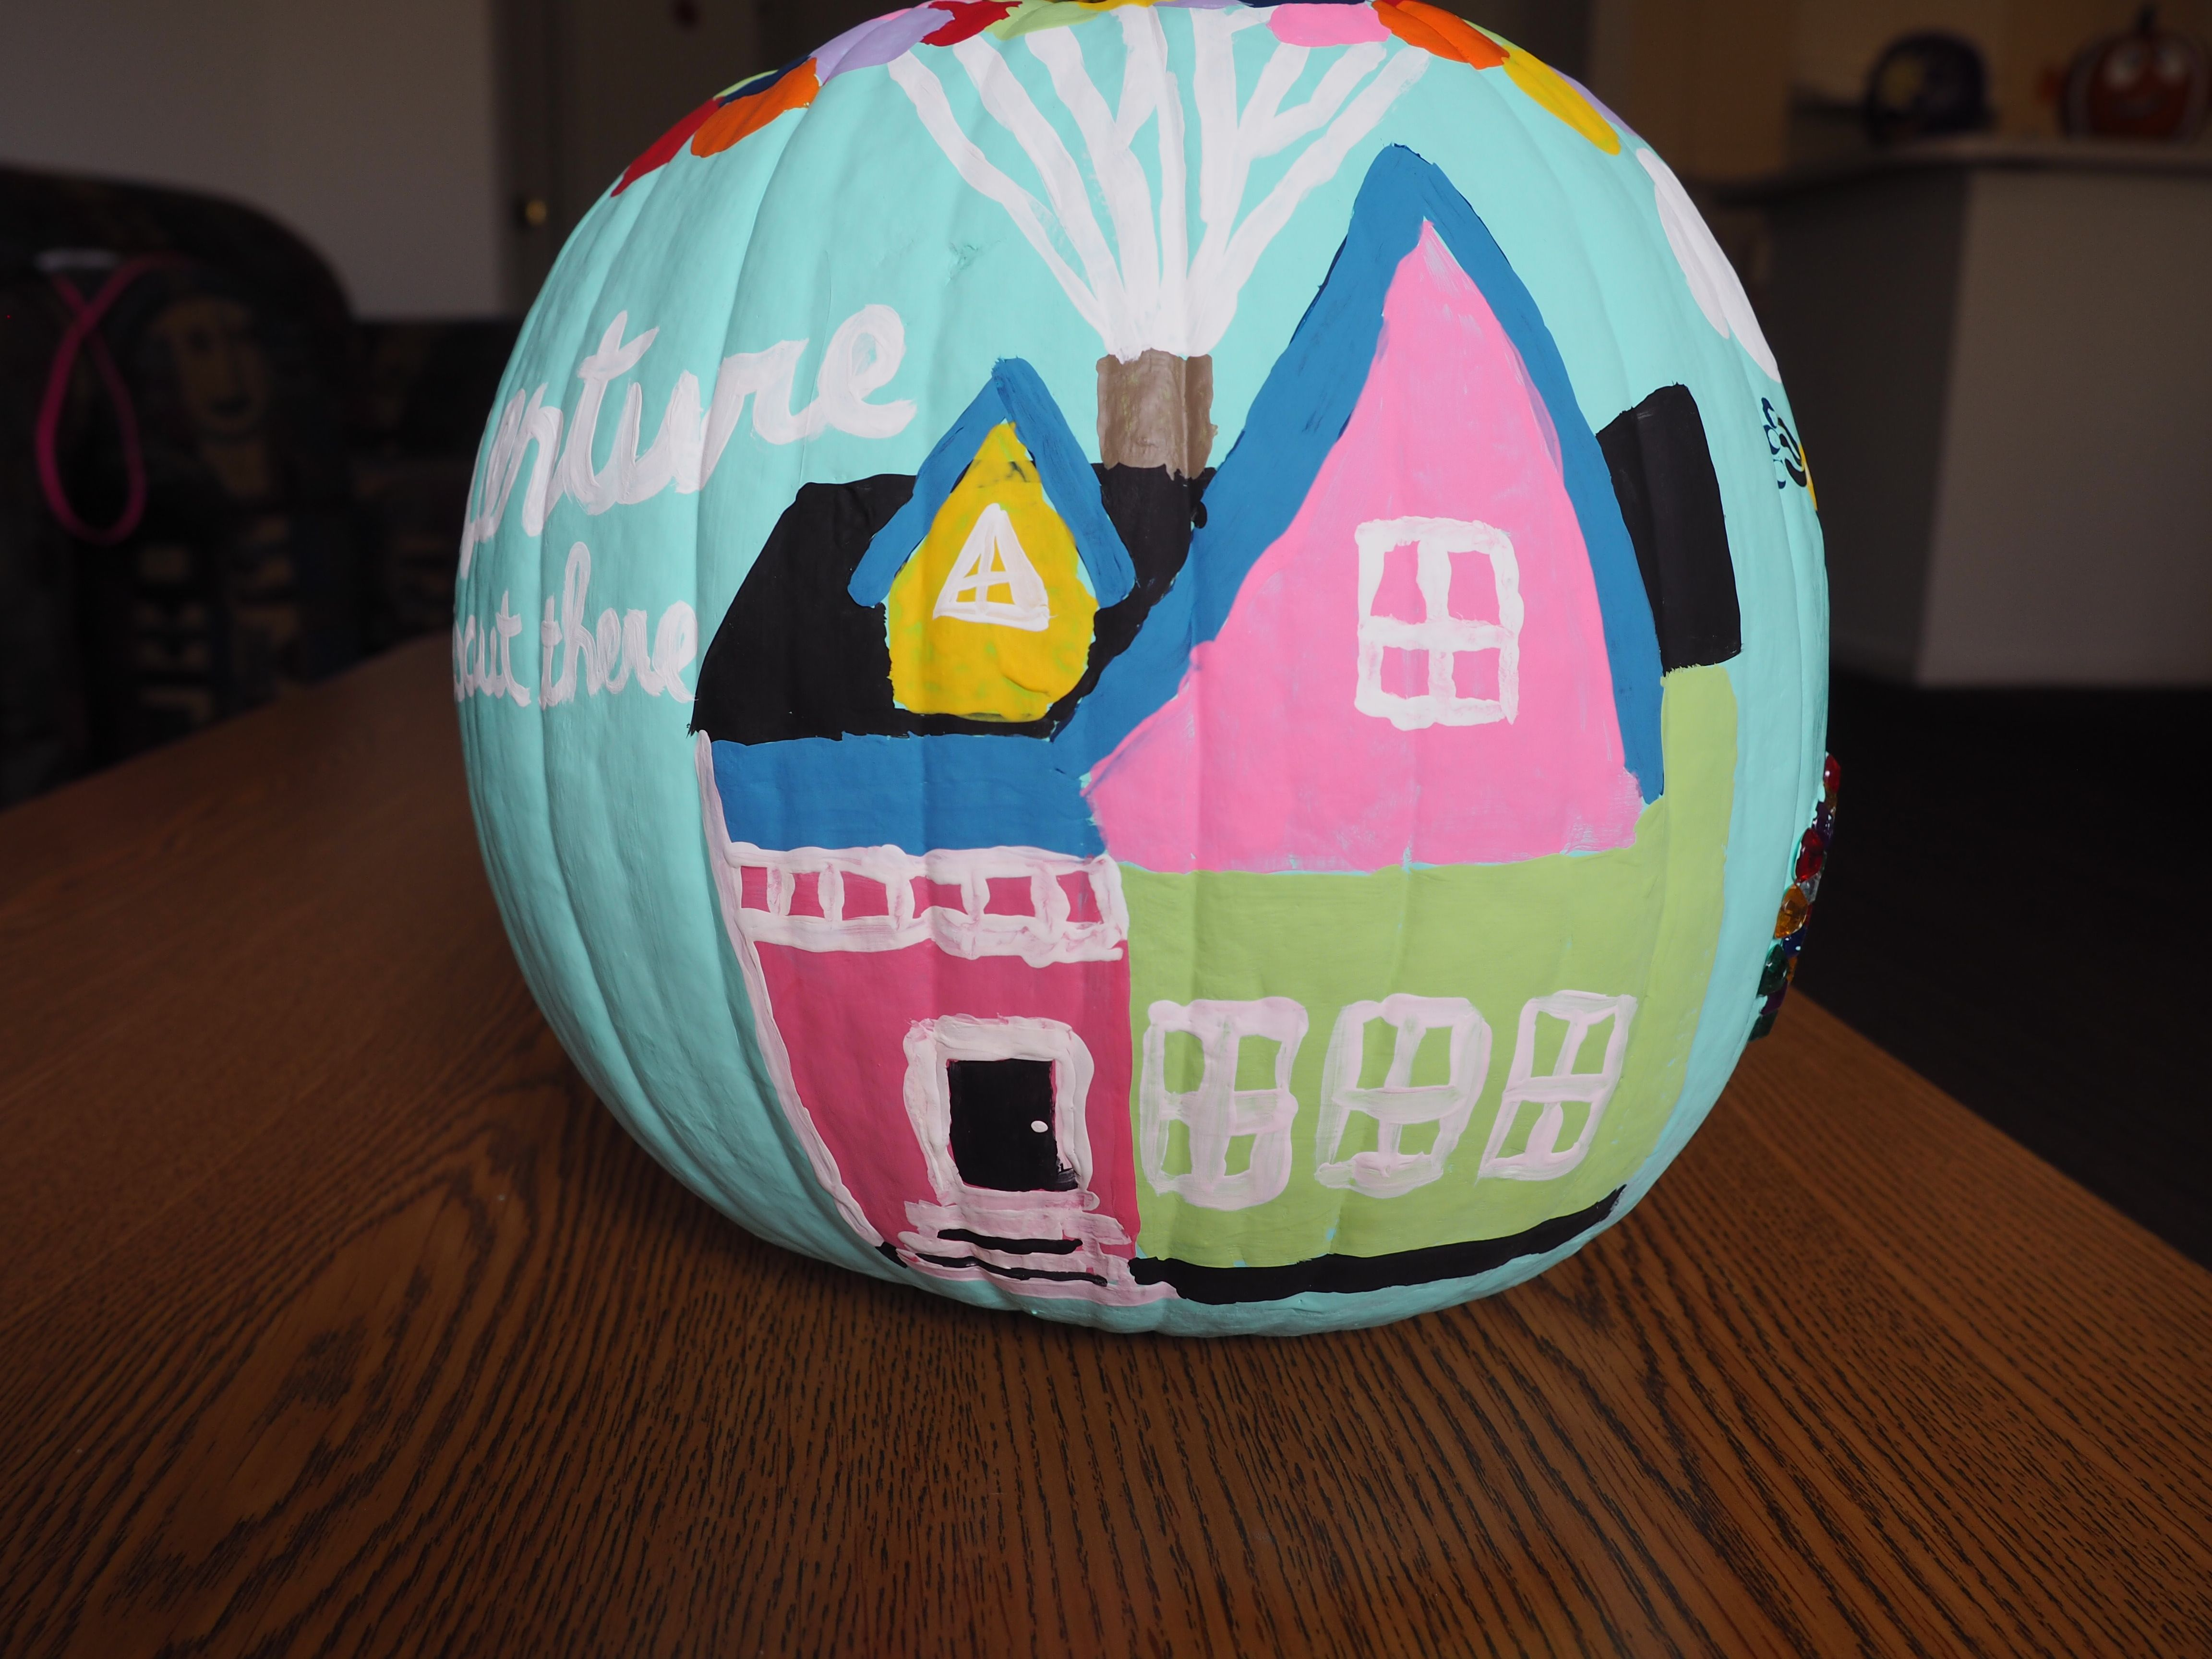 Up House Pumpkin Painting Painted Pumpkins Pumpkin Decorating Pumpkin Carving